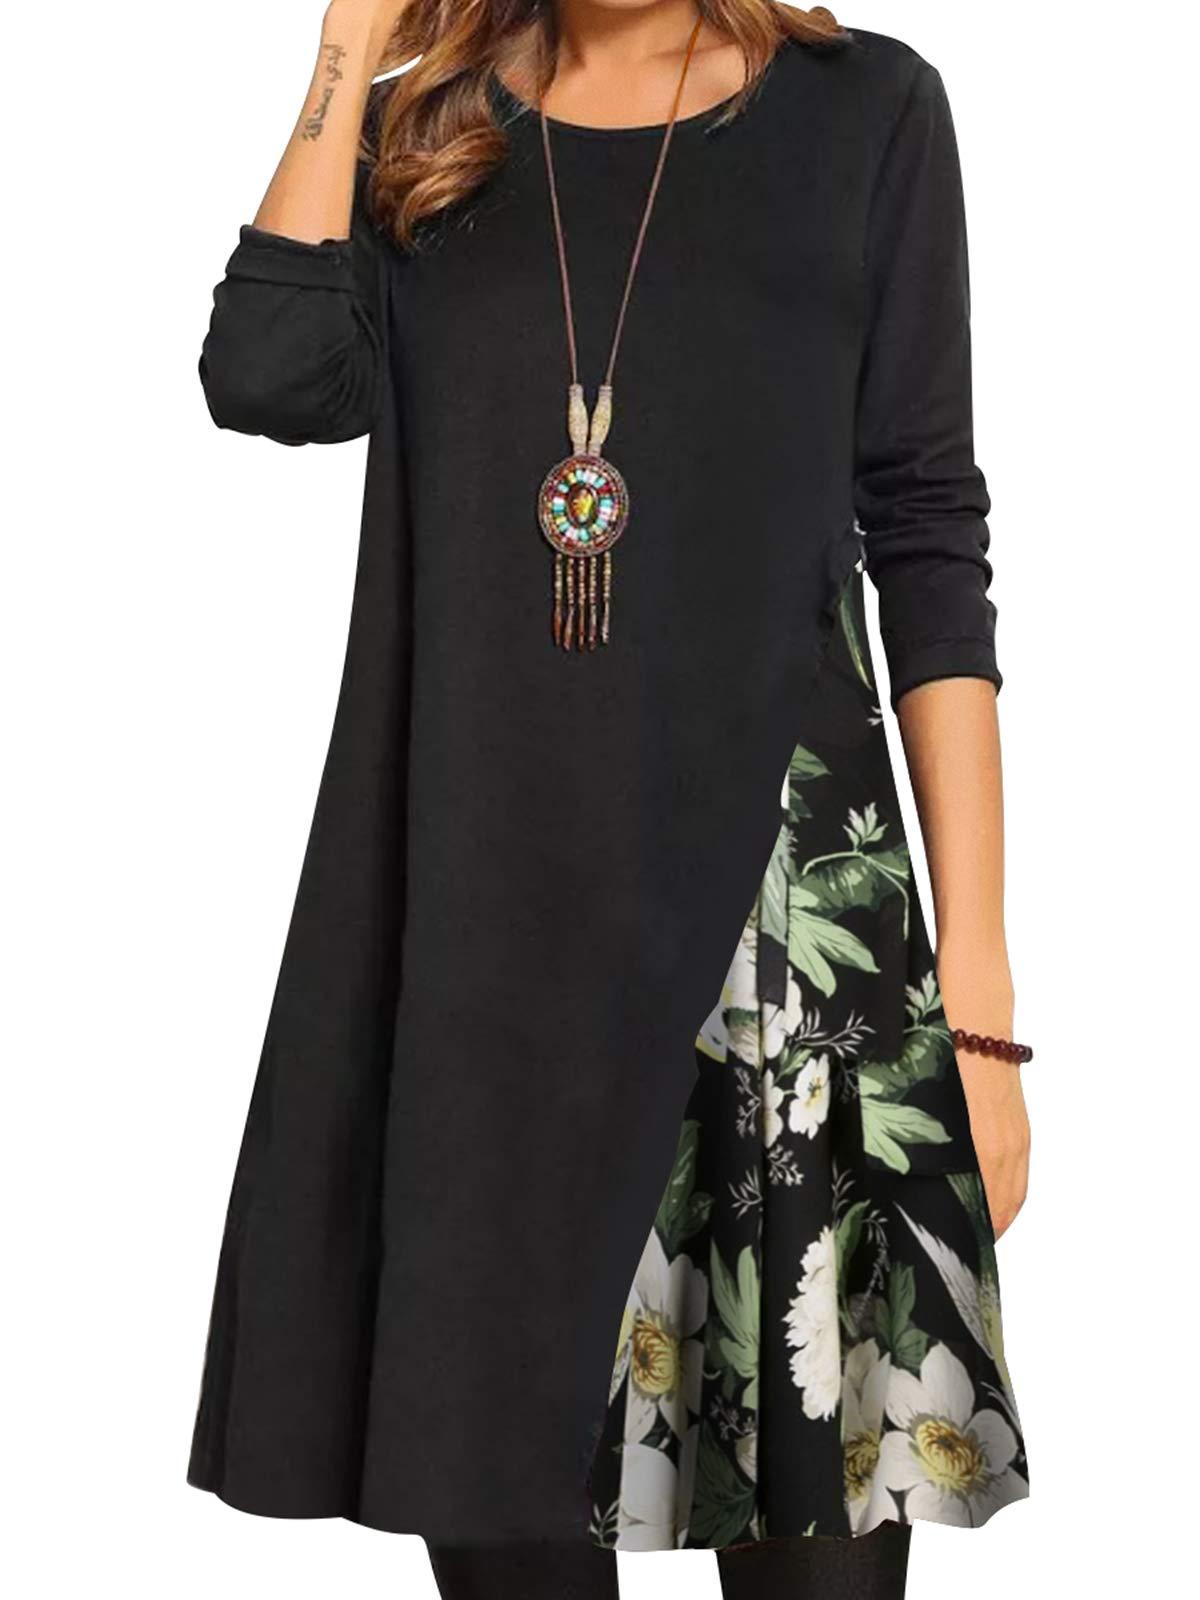 Bonny Billy Women's Patchwork Plain Dress Casual Shift Black Dresses Small